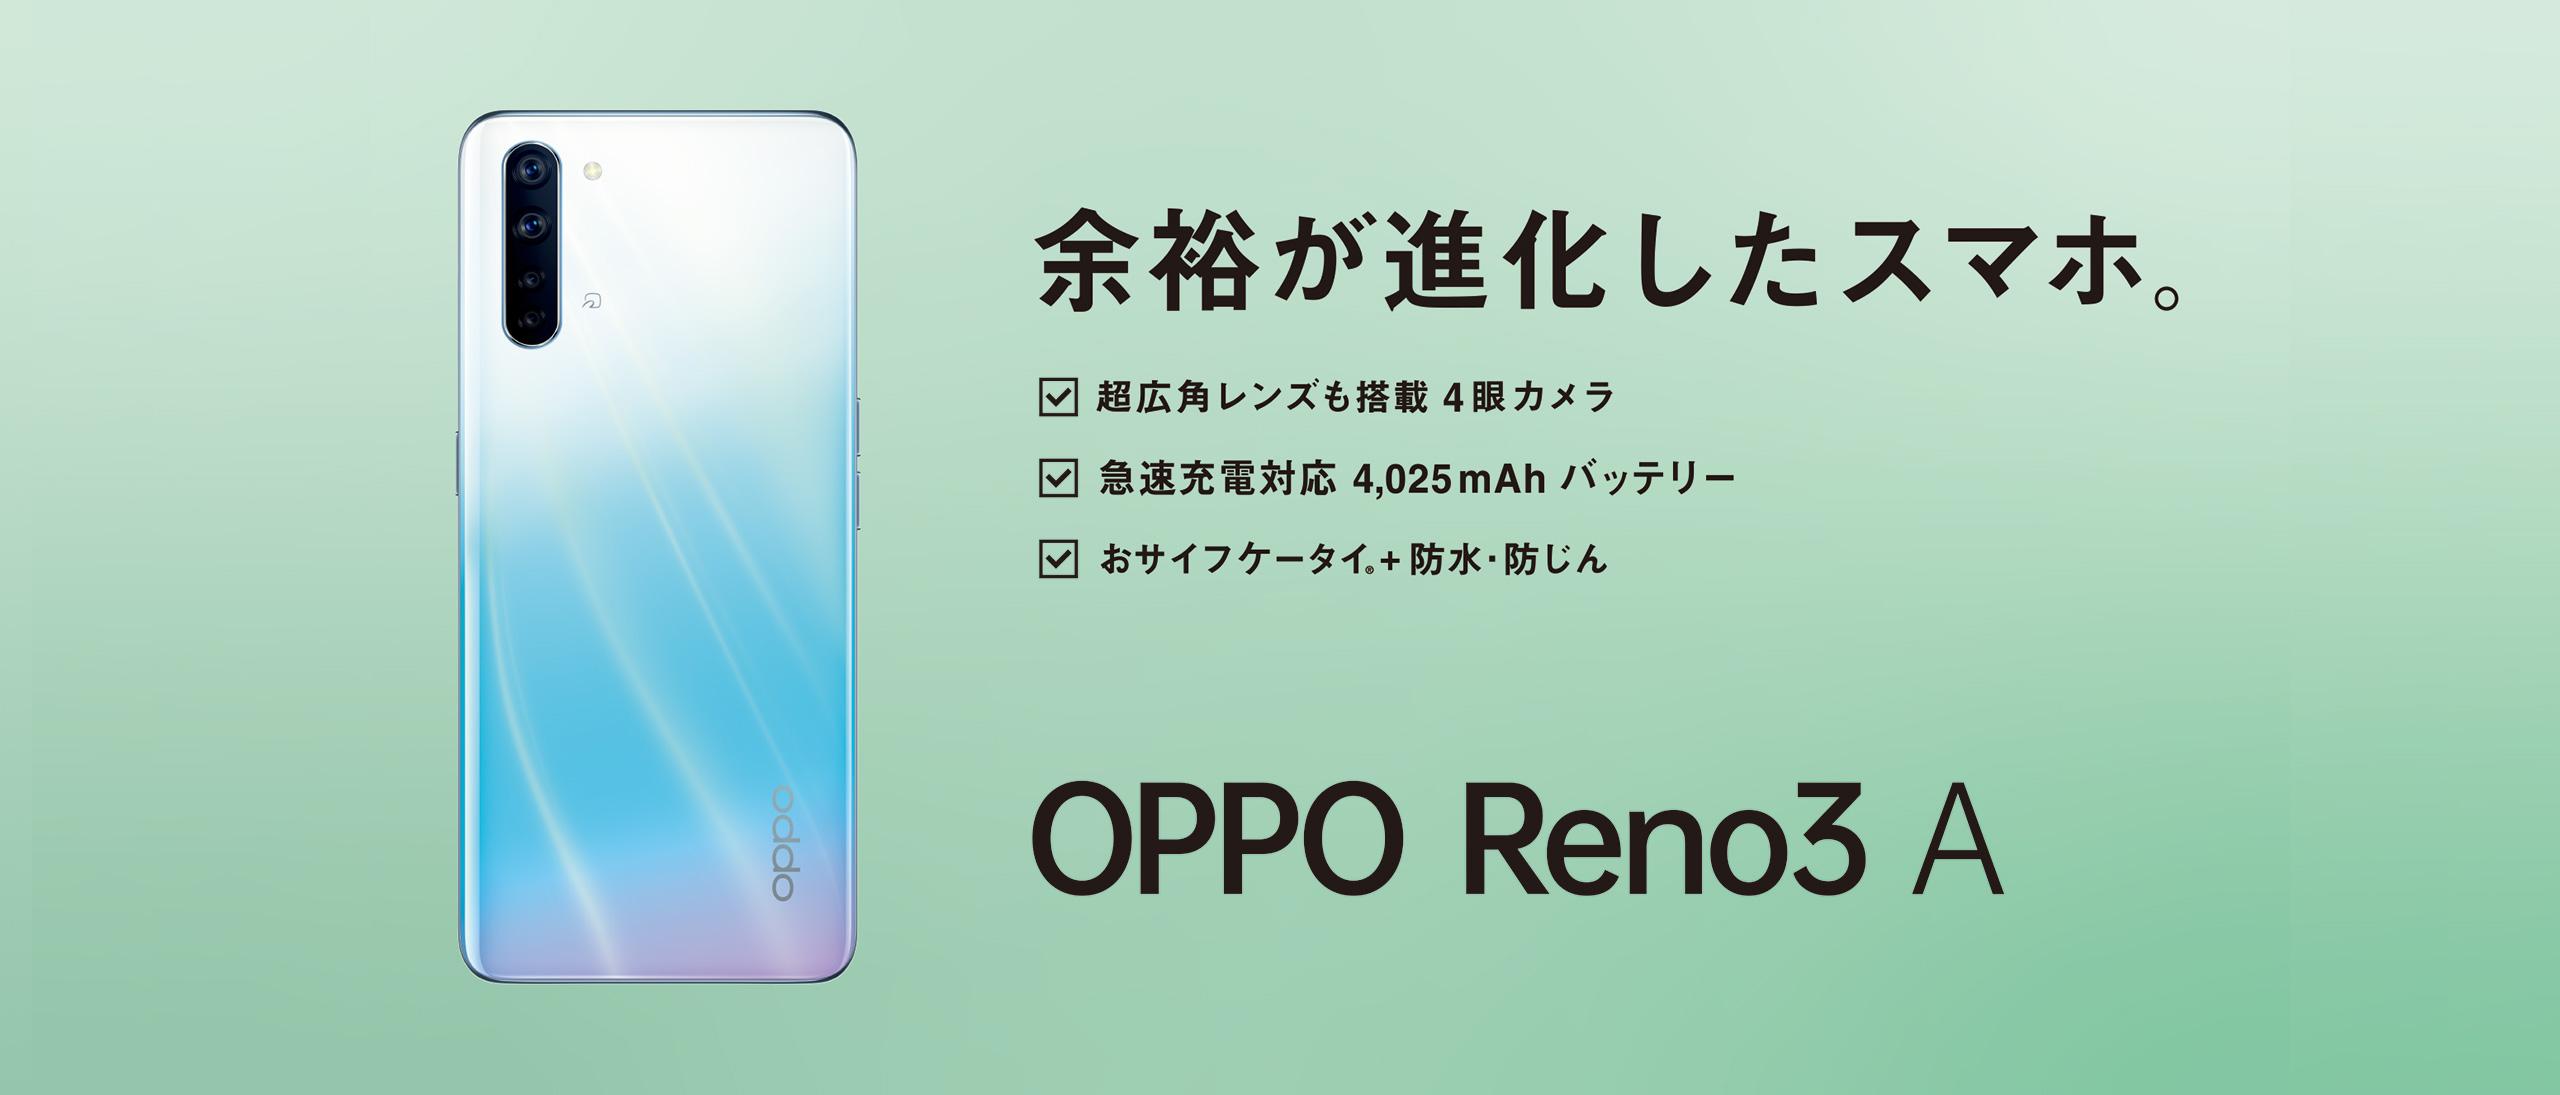 3 a リノ オッポ 【楽天市場】OPPO Reno3